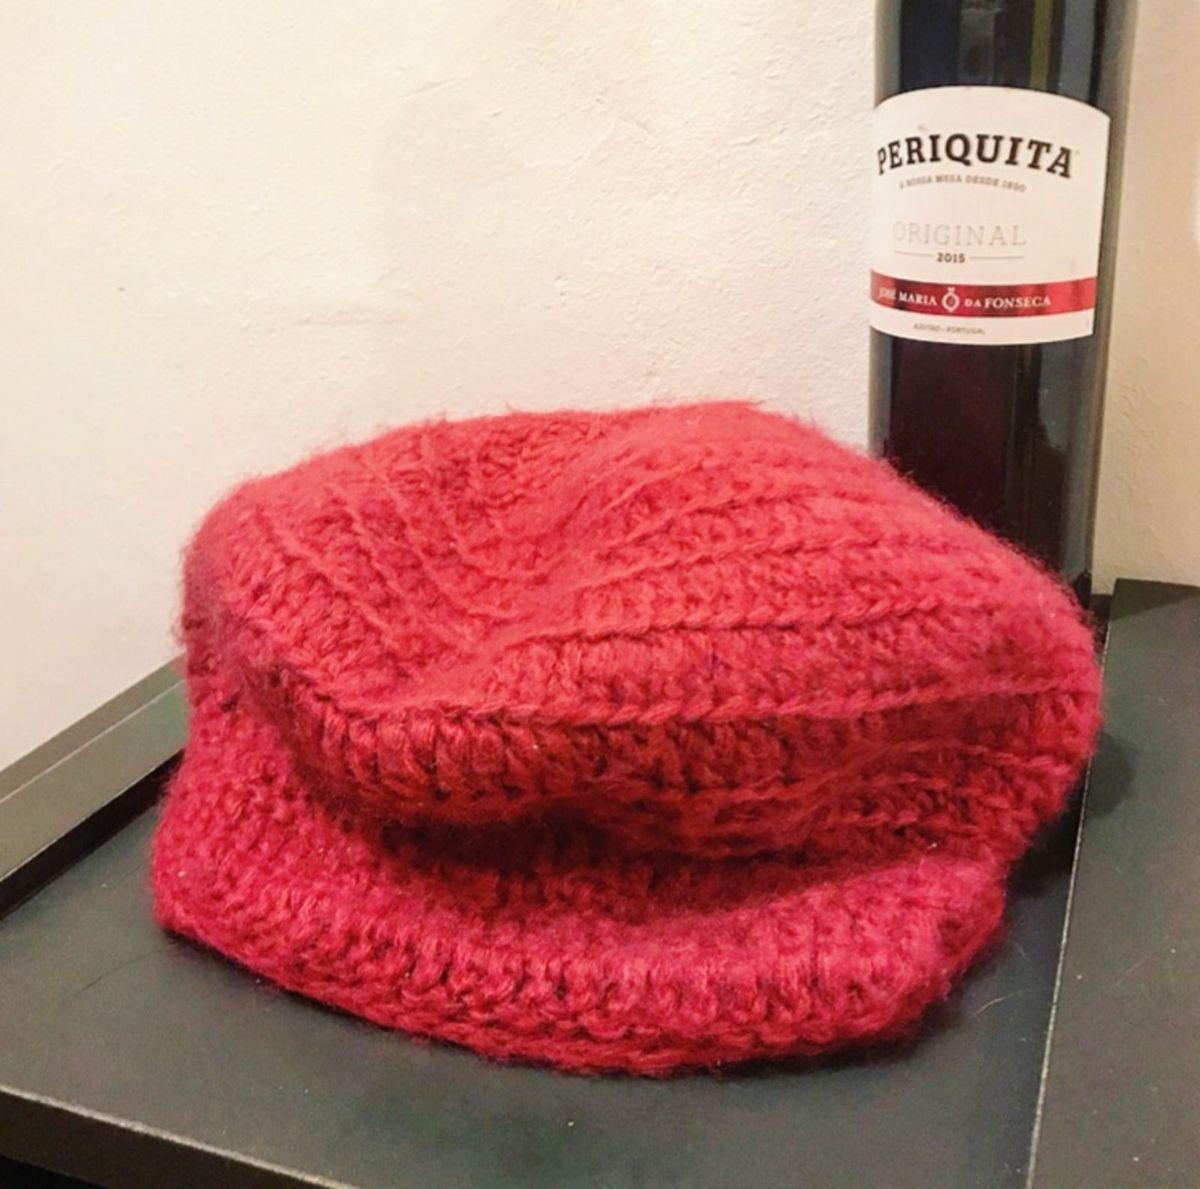 boina vermelha de crochê - chapeu renner.  Czm6ly9wag90b3muzw5qb2vplmnvbs5ici9wcm9kdwn0cy8xnzuwmzgvztu3njazmwjmnje5nge5oti2zgy1zgy3yzhinzg4ztiuanbn  ... 9ad49330345